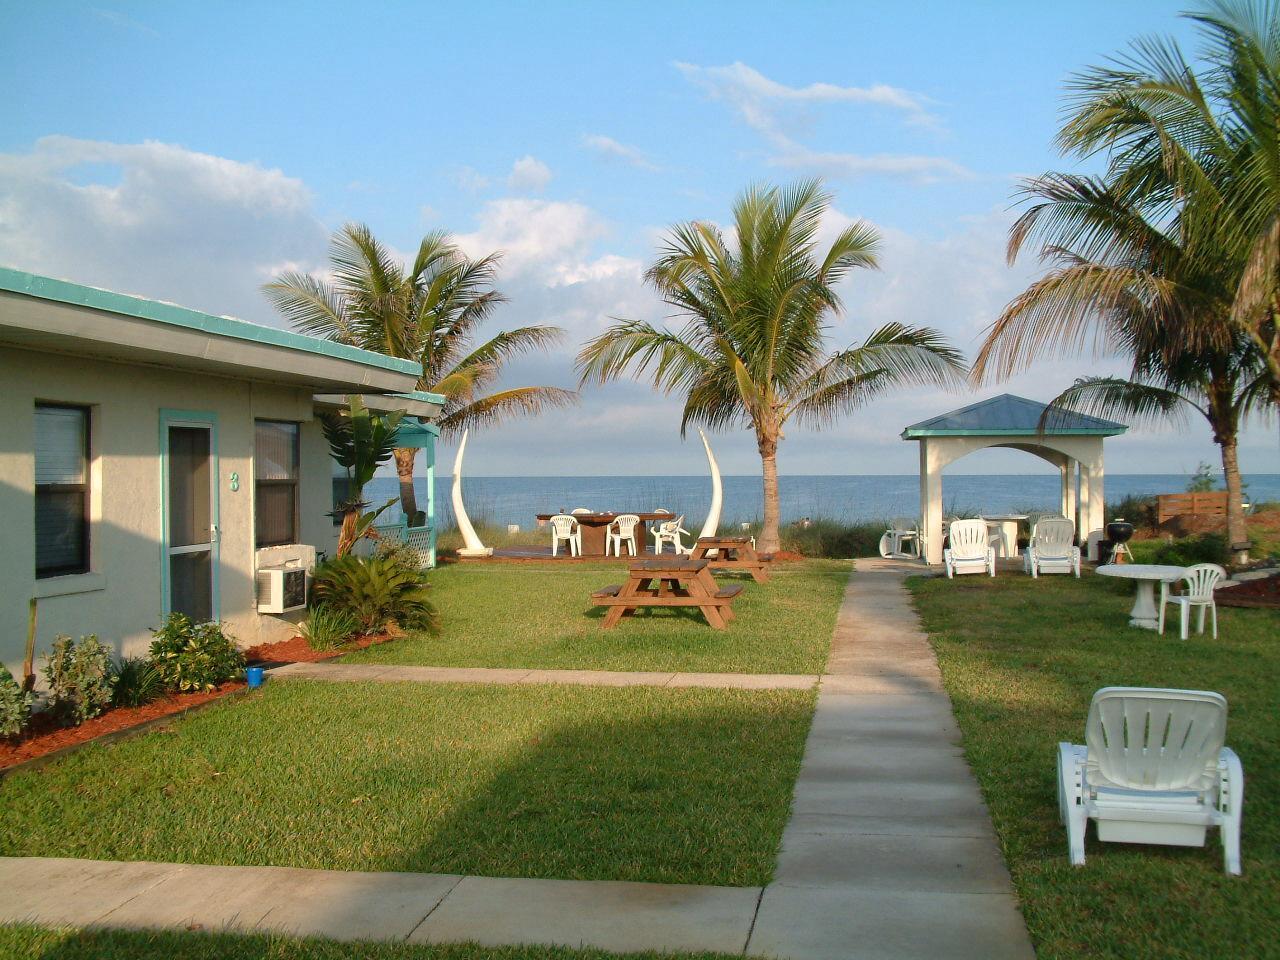 Gulf Sands Beach Motel On the beach beach front Florida